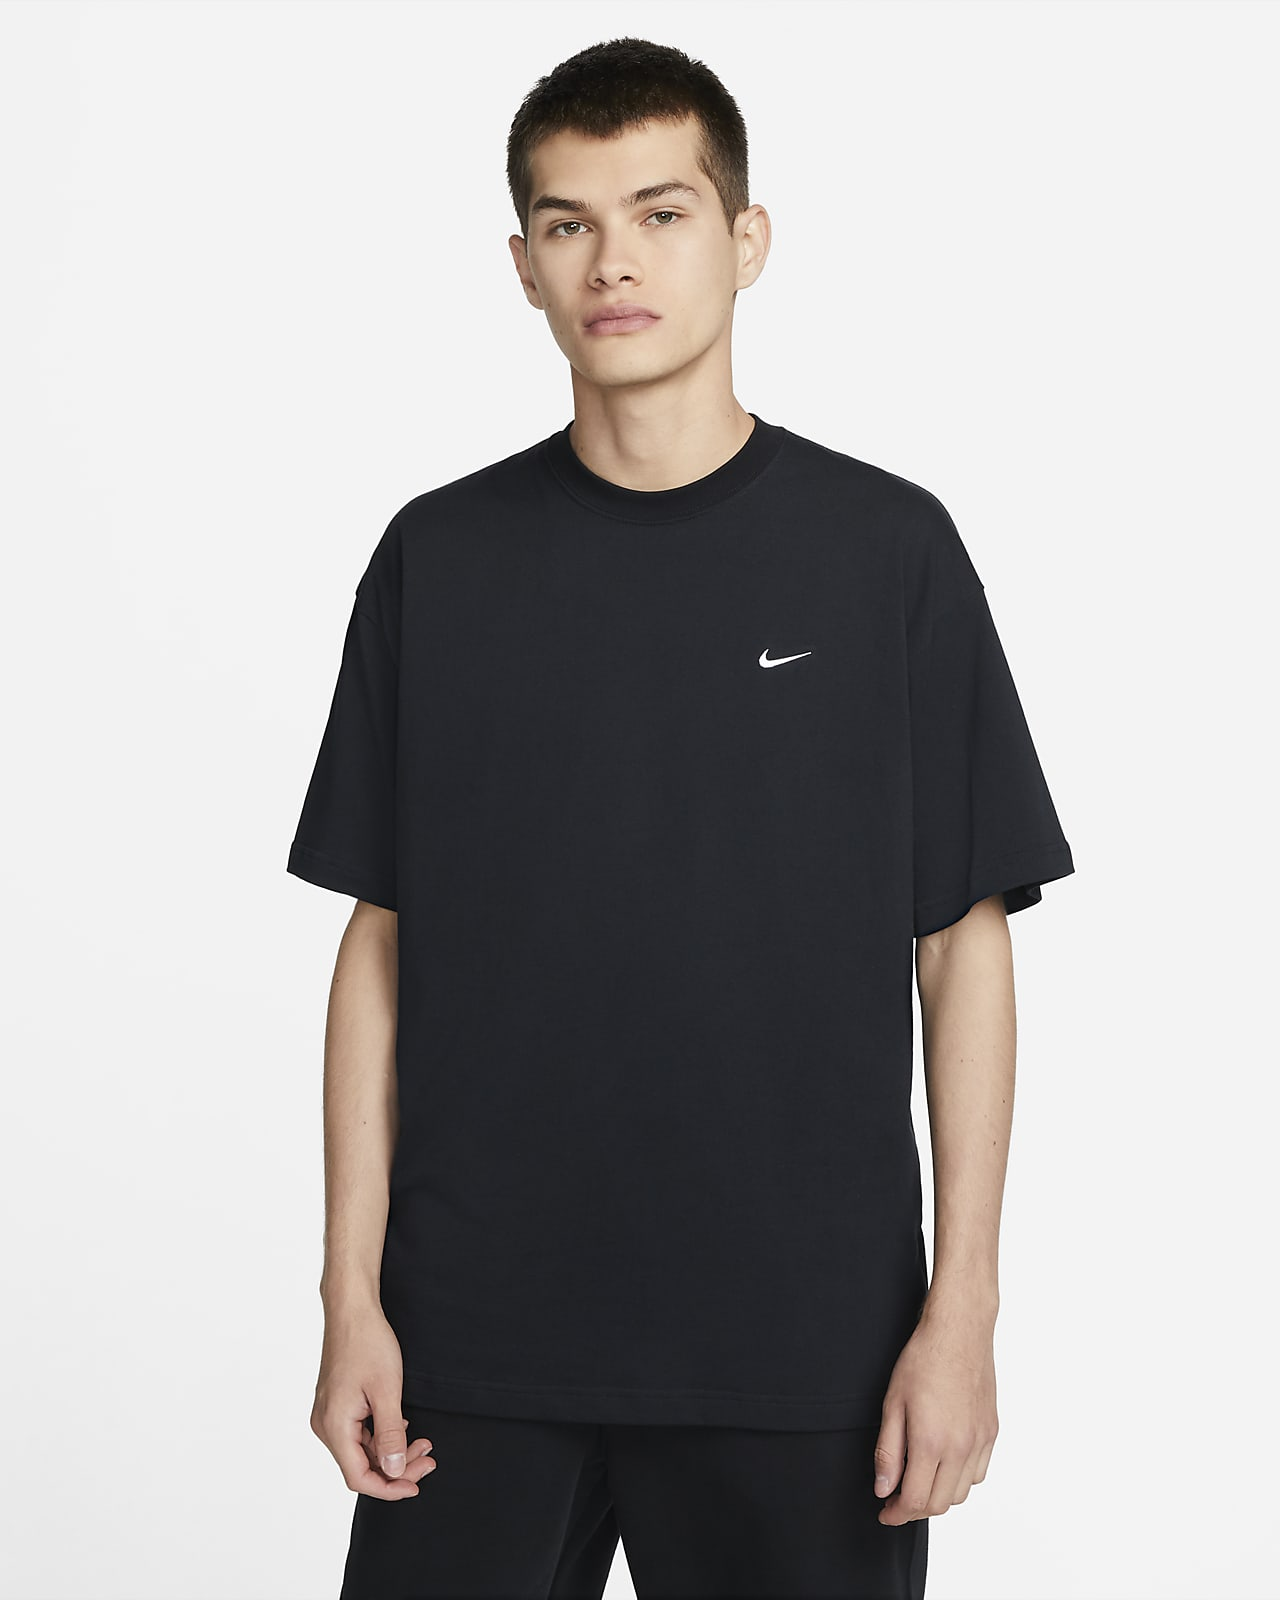 Playera para hombre NikeLab